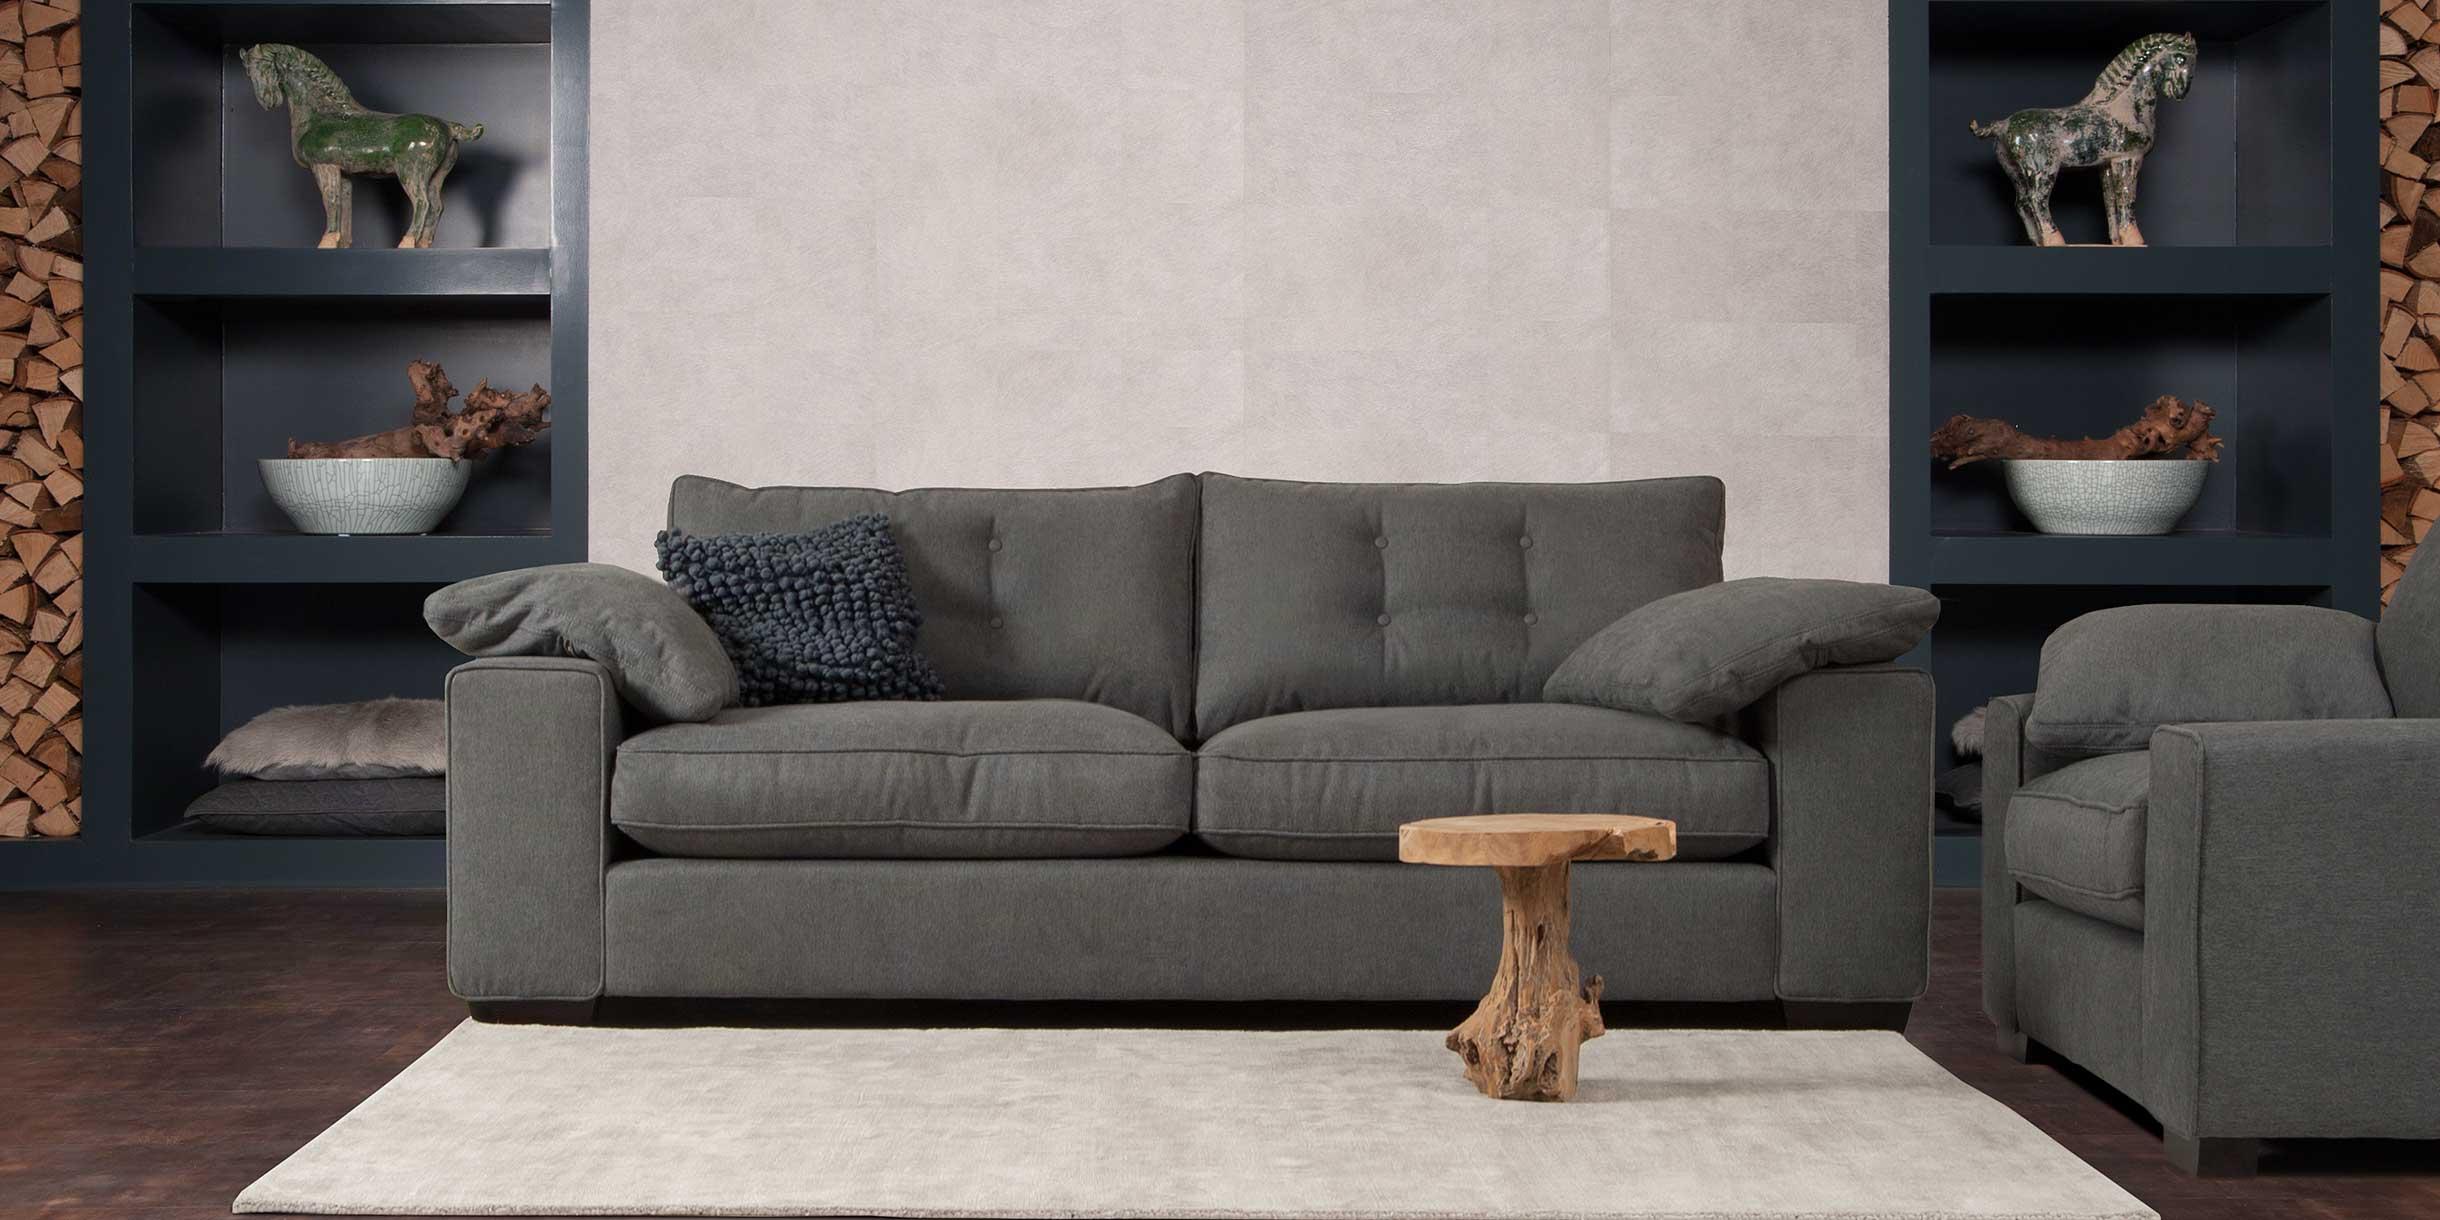 UrbanSofa-Firenca-Sofa-Presto